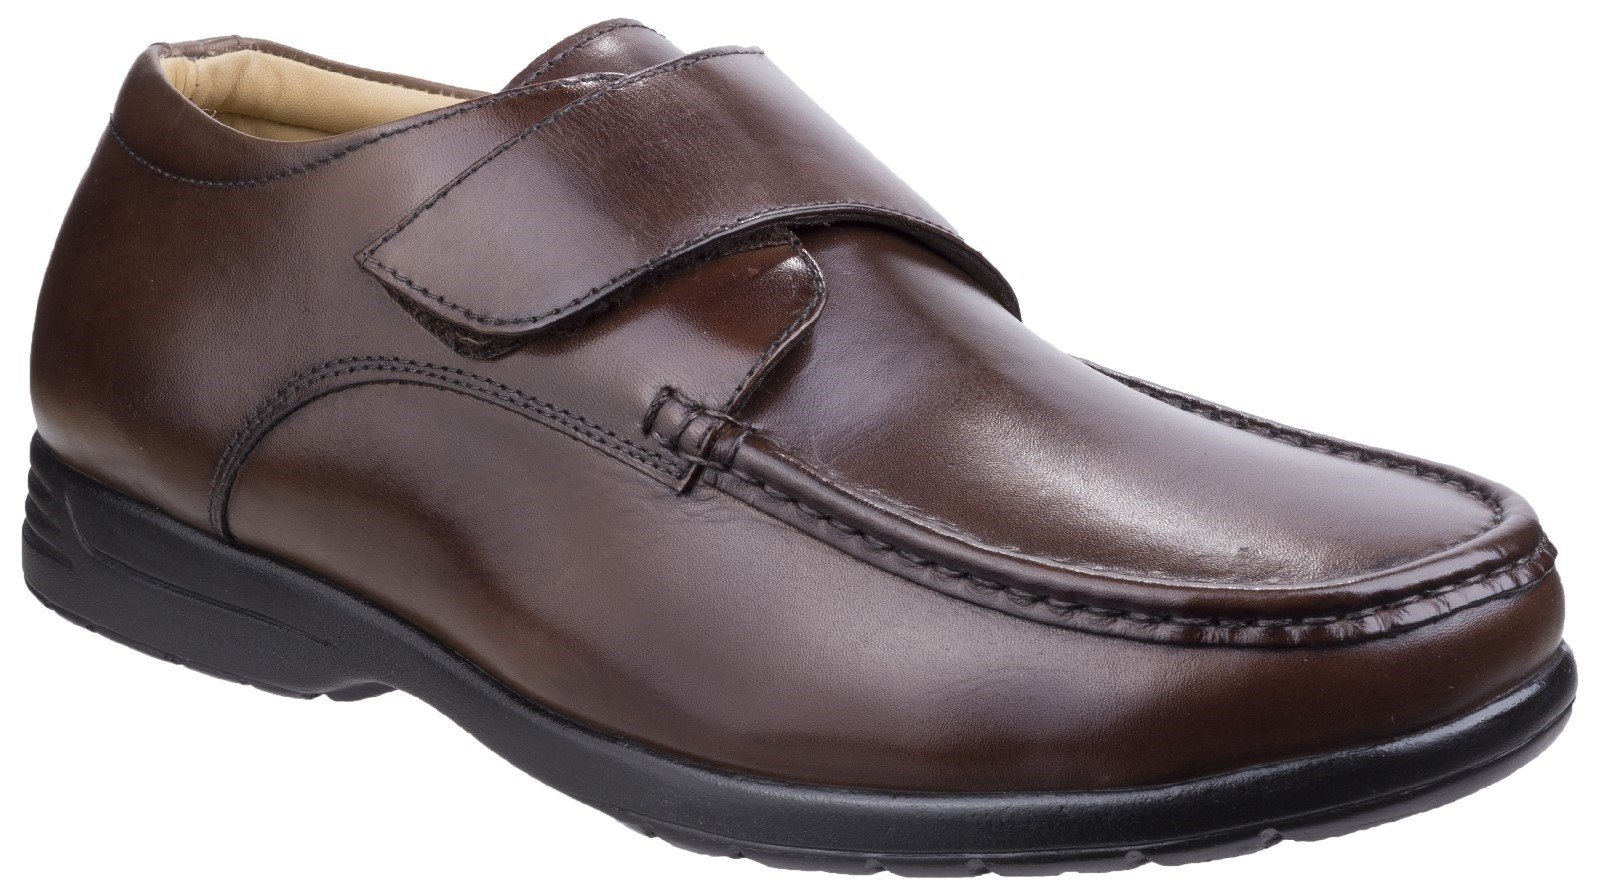 Fleet & Foster Men's Fred Dual Fit Moccasin Black 26320-43938 - Brown 6